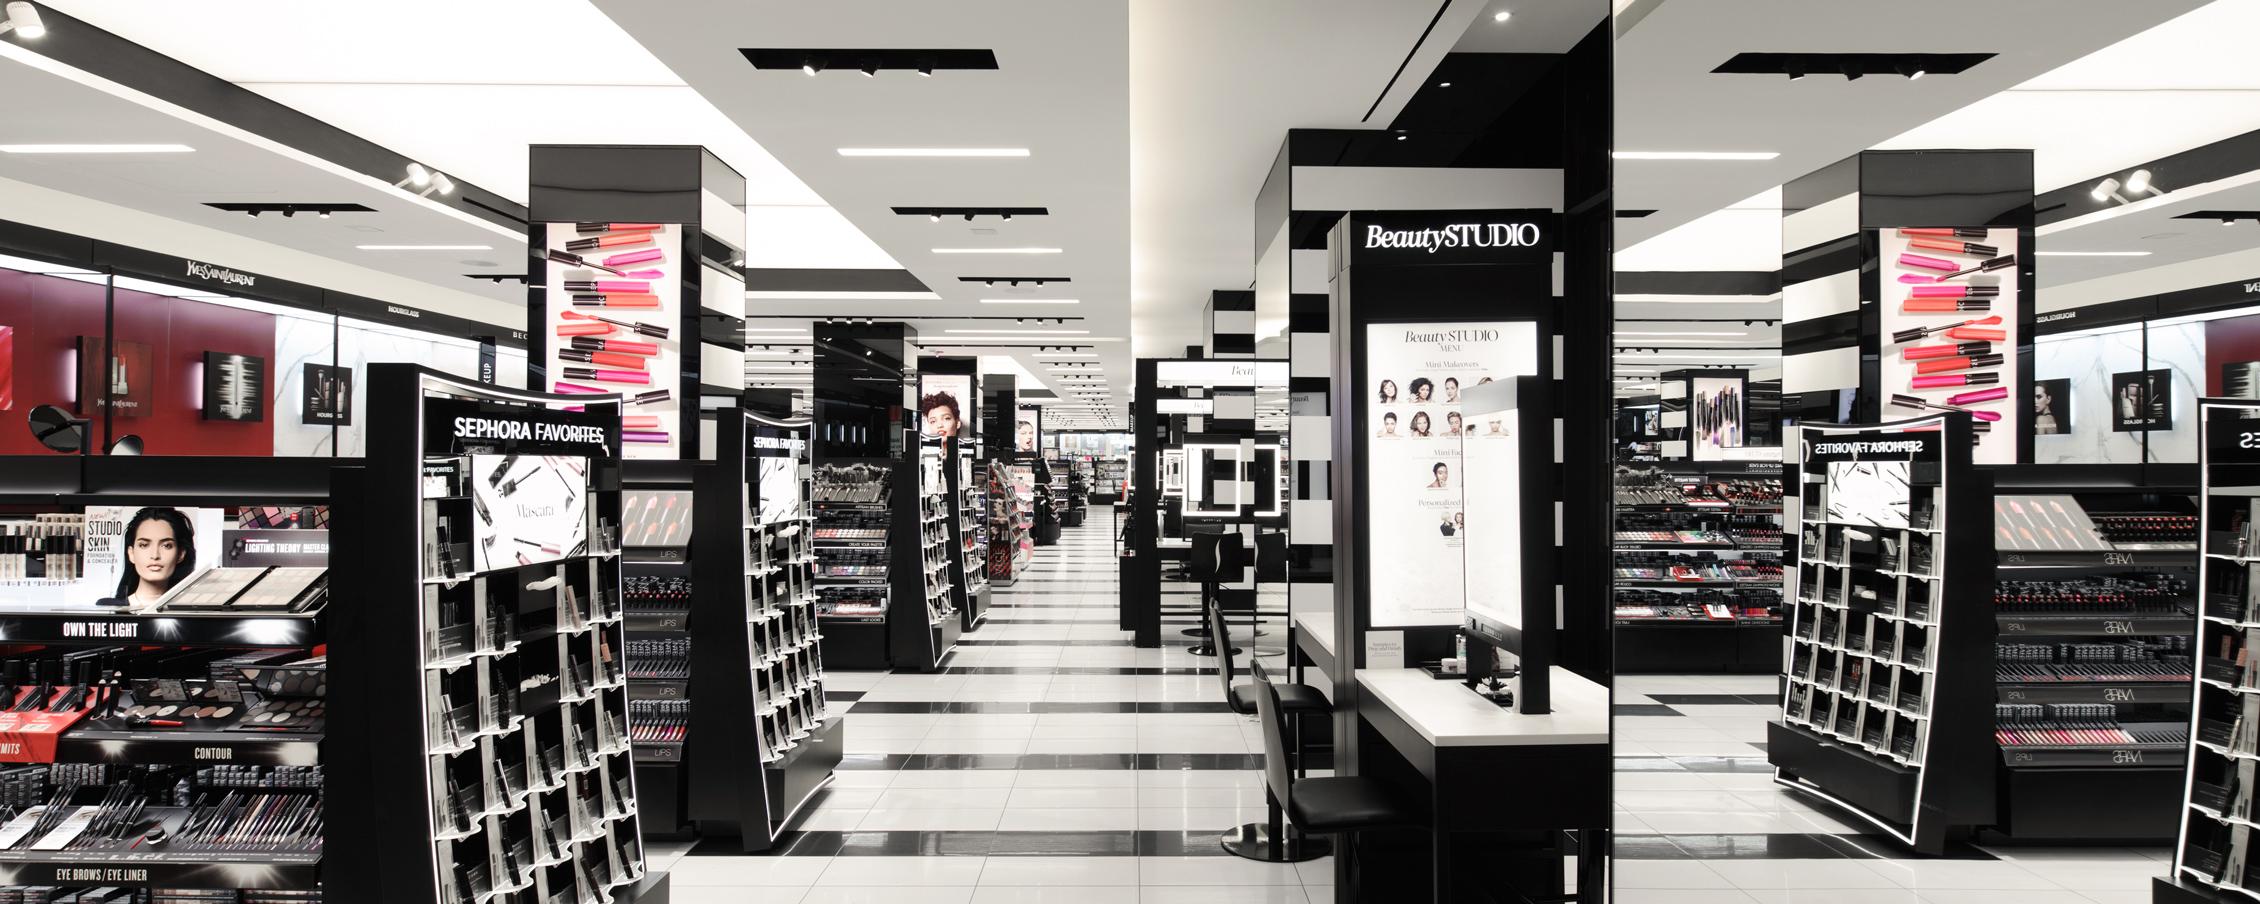 sephora retail observation